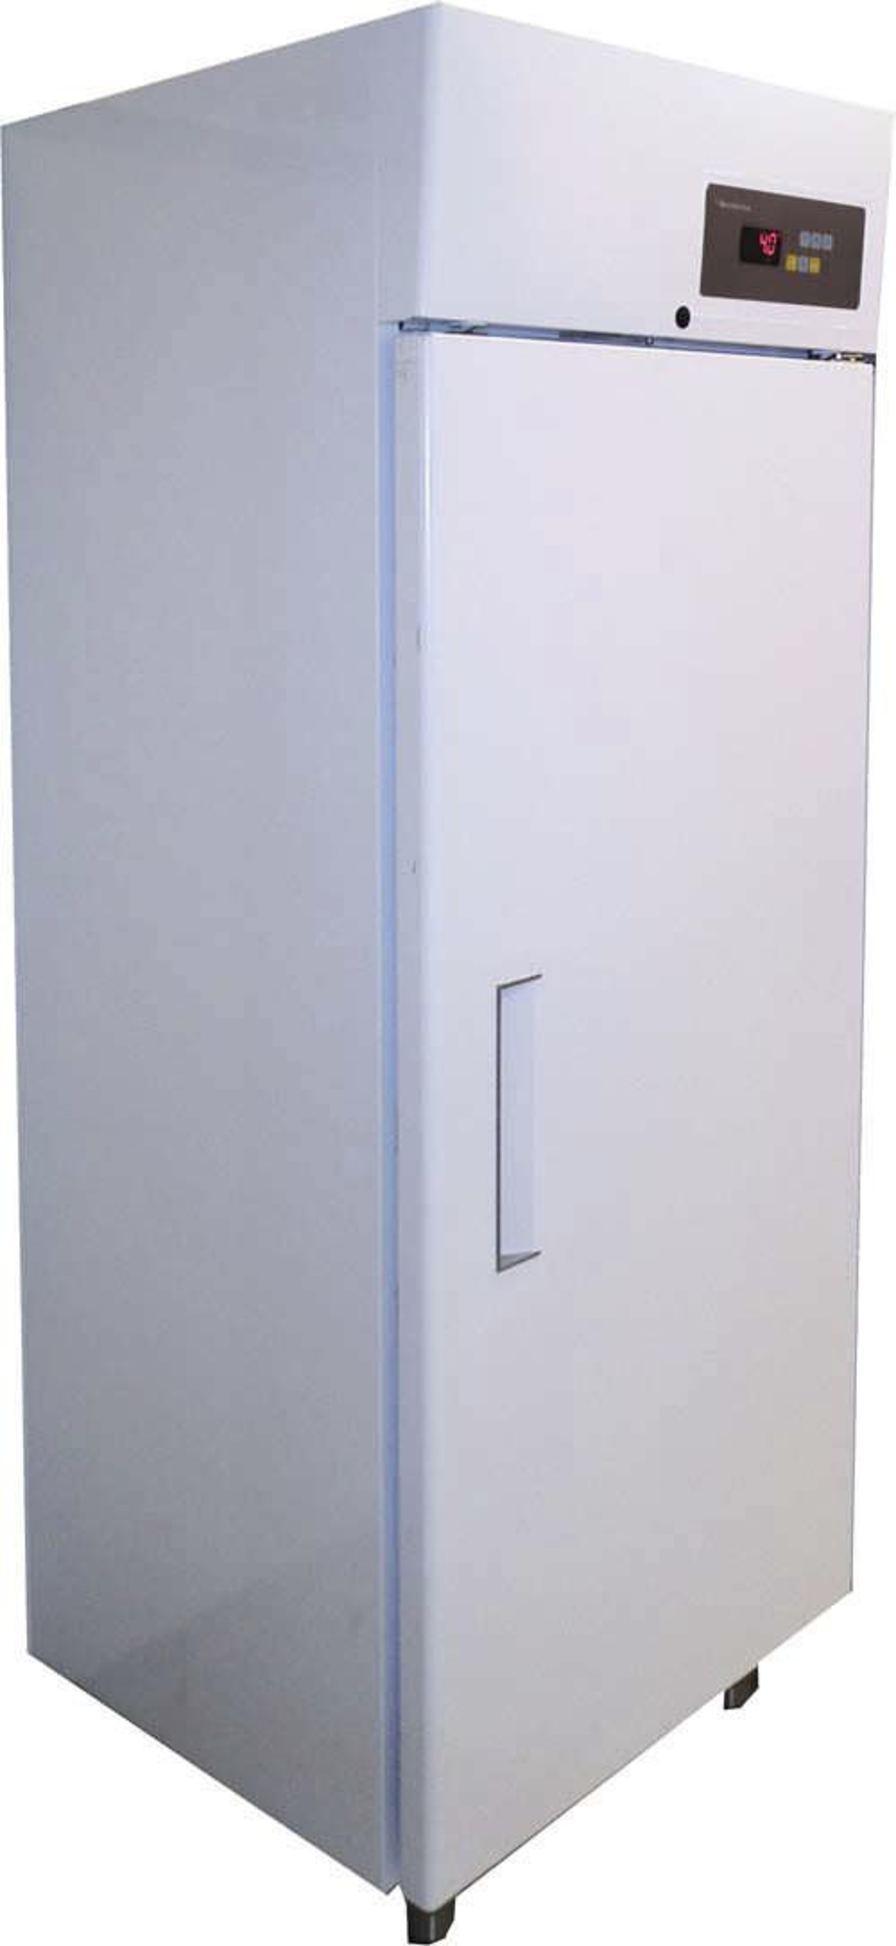 Laboratory refrigerator / cabinet / 1-door IKS LR series IKS International